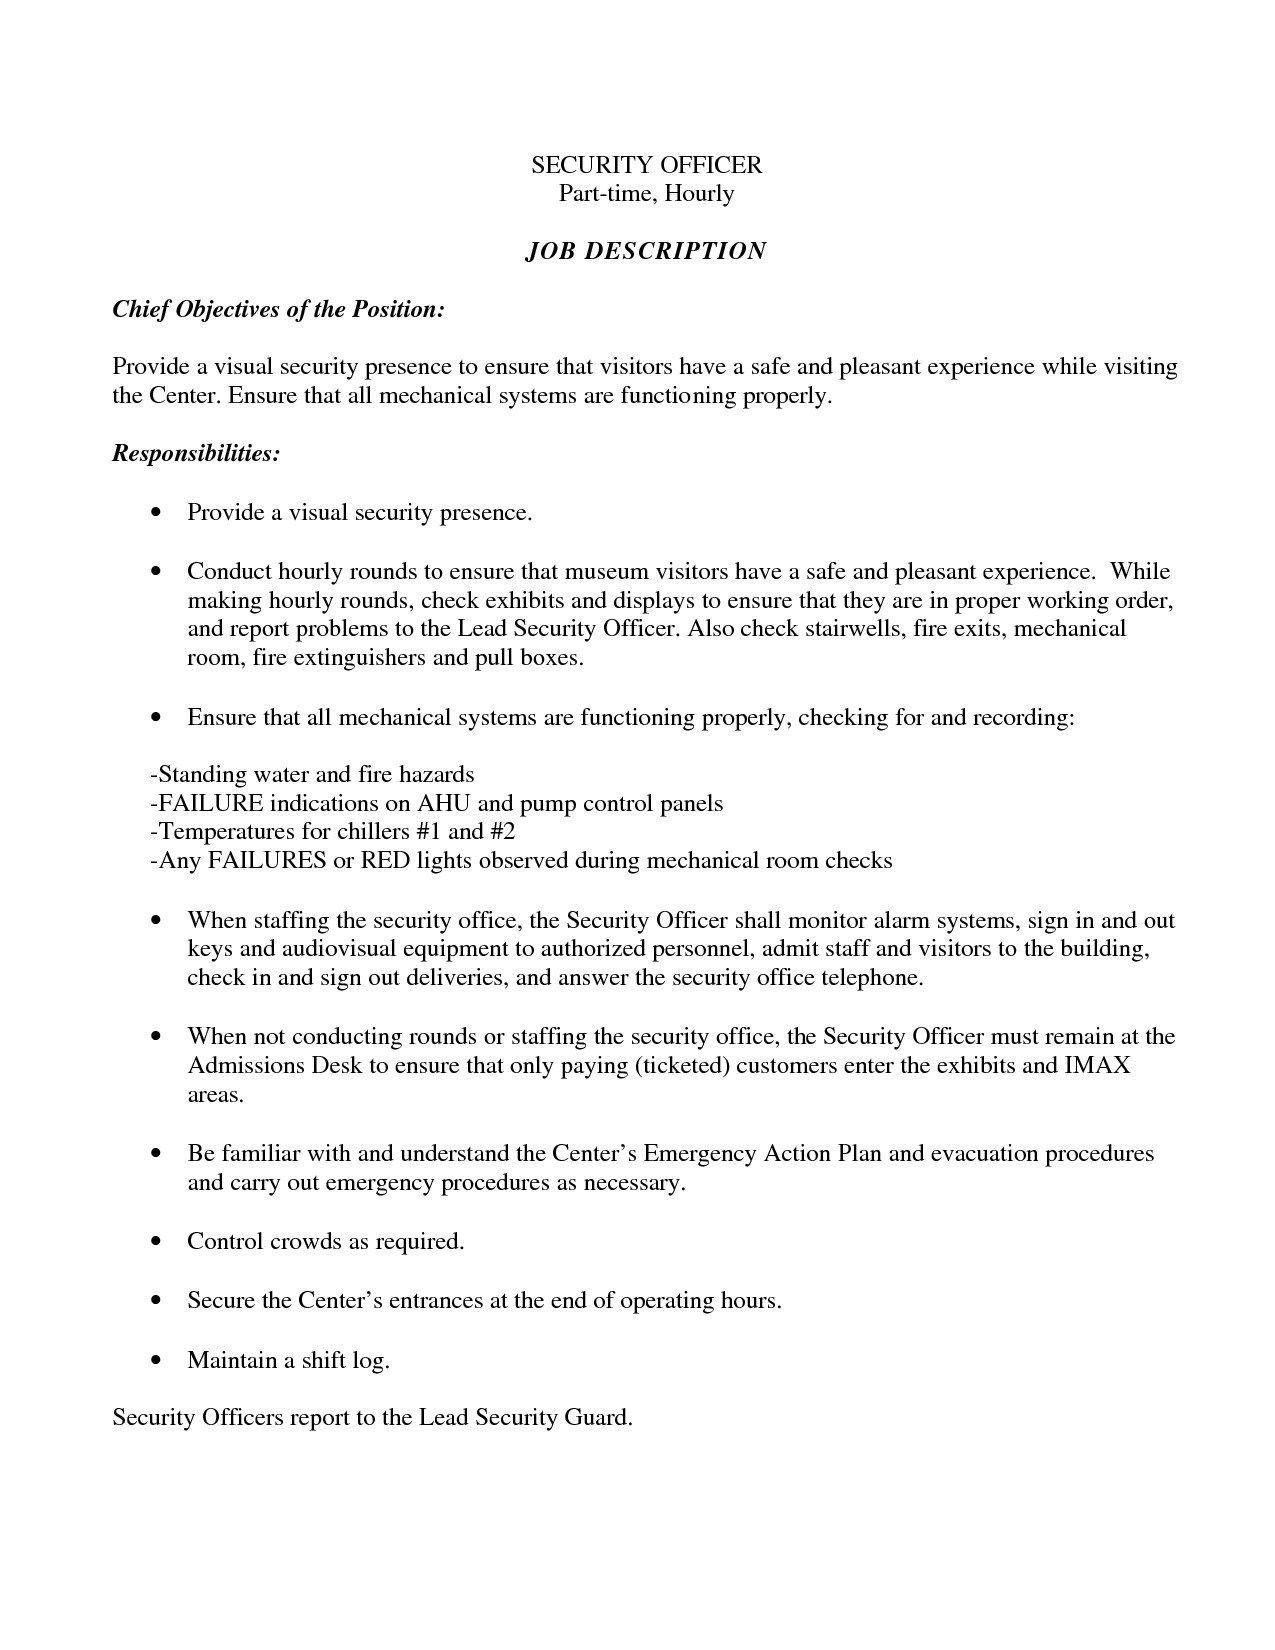 Easy Resume Tips Objective to Follow Job resume